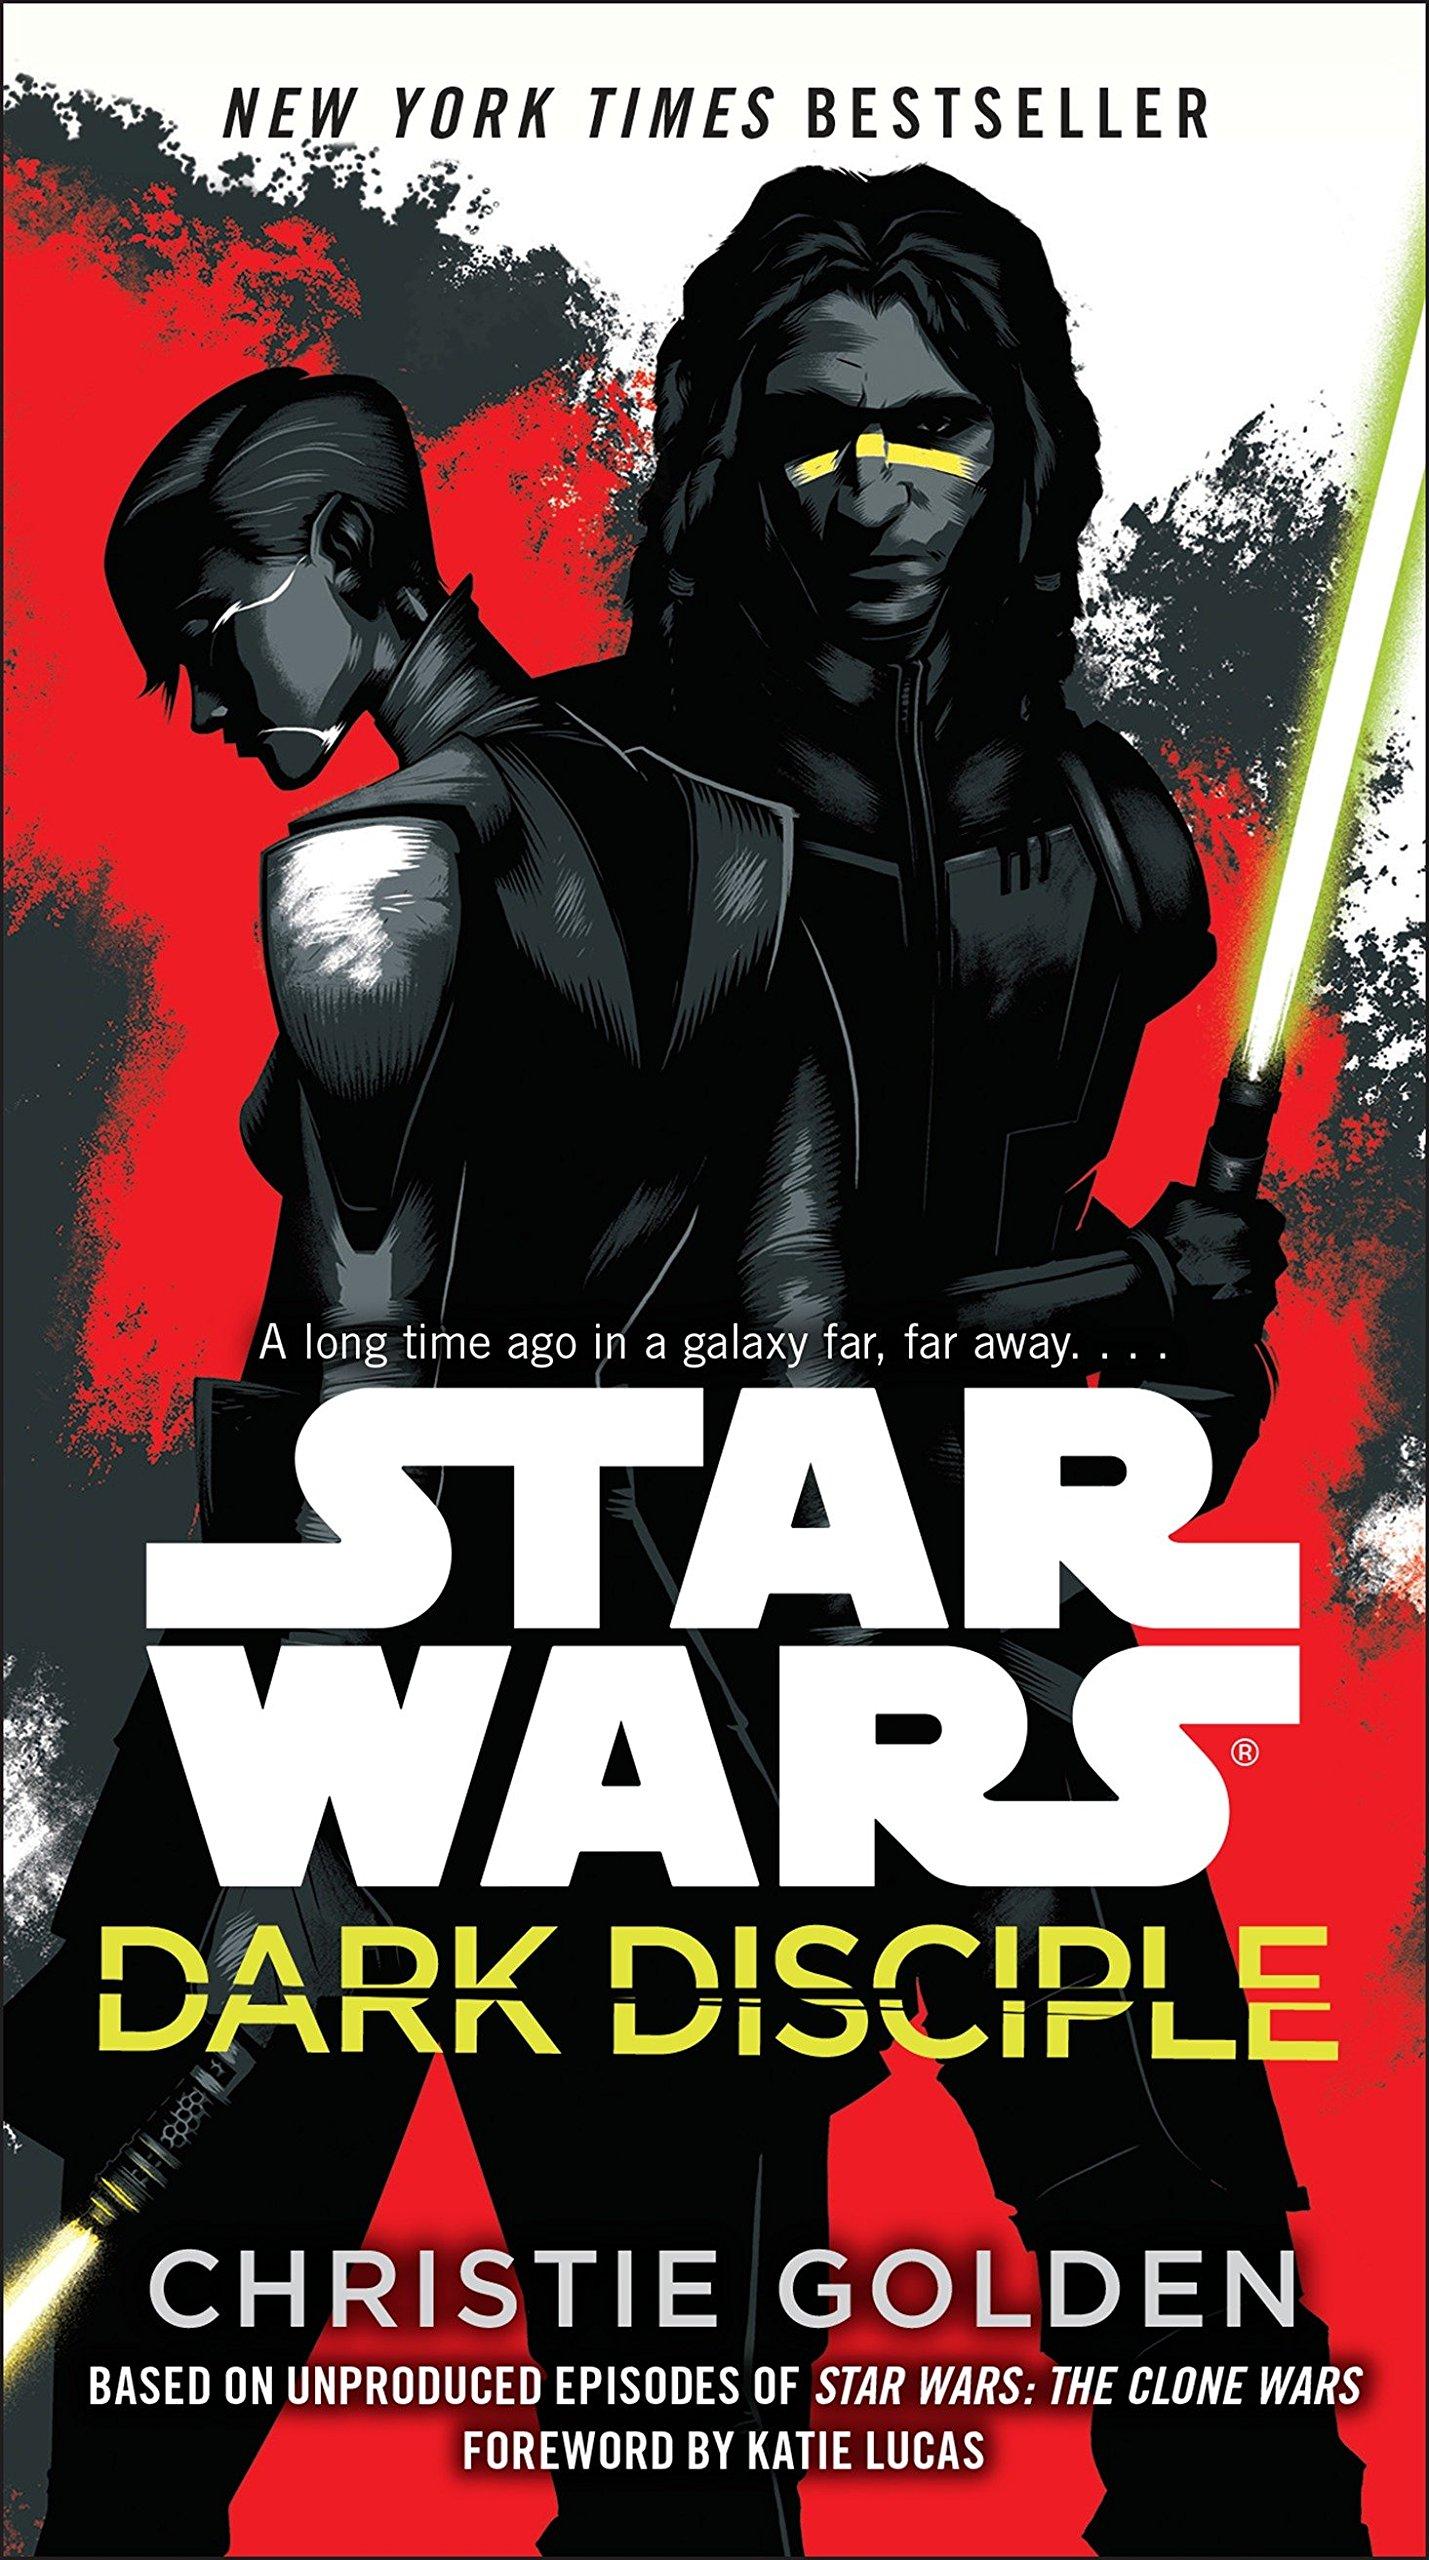 Star Wars: Dark Disciple (paperback)